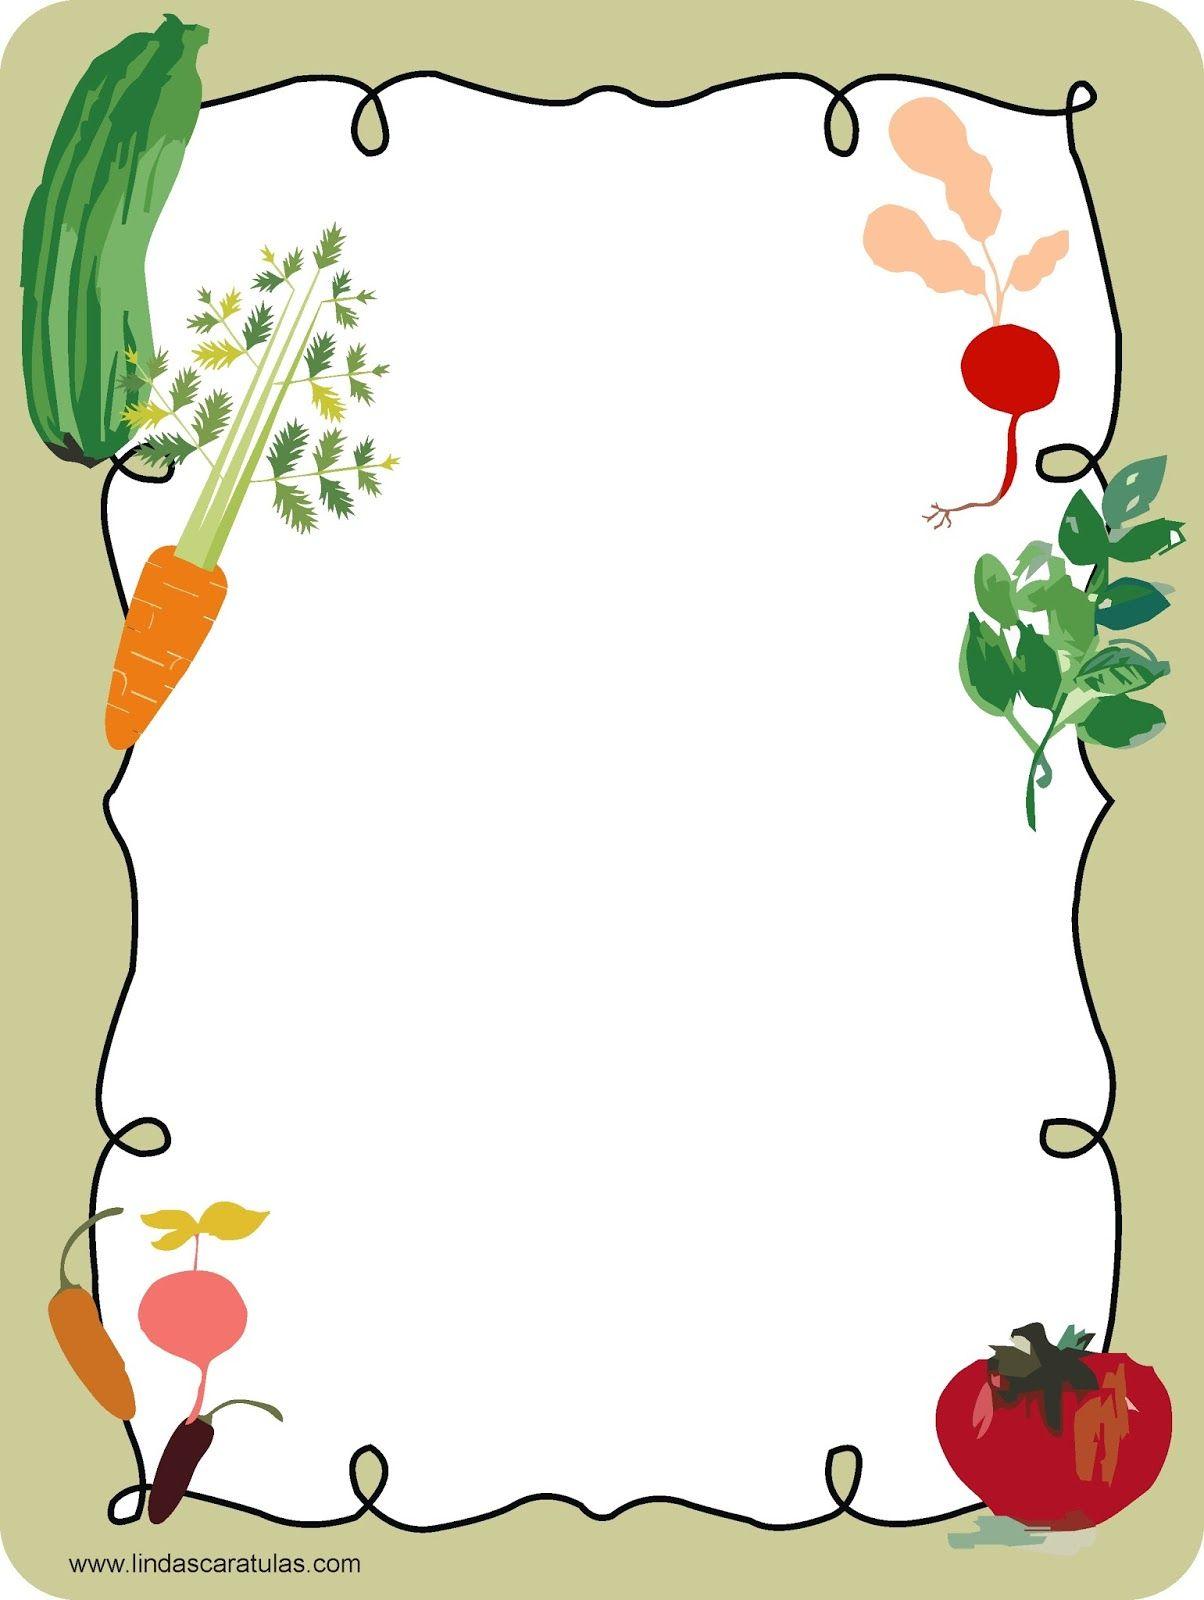 Caratulas Verduras2 1 204 1 600 Pixels